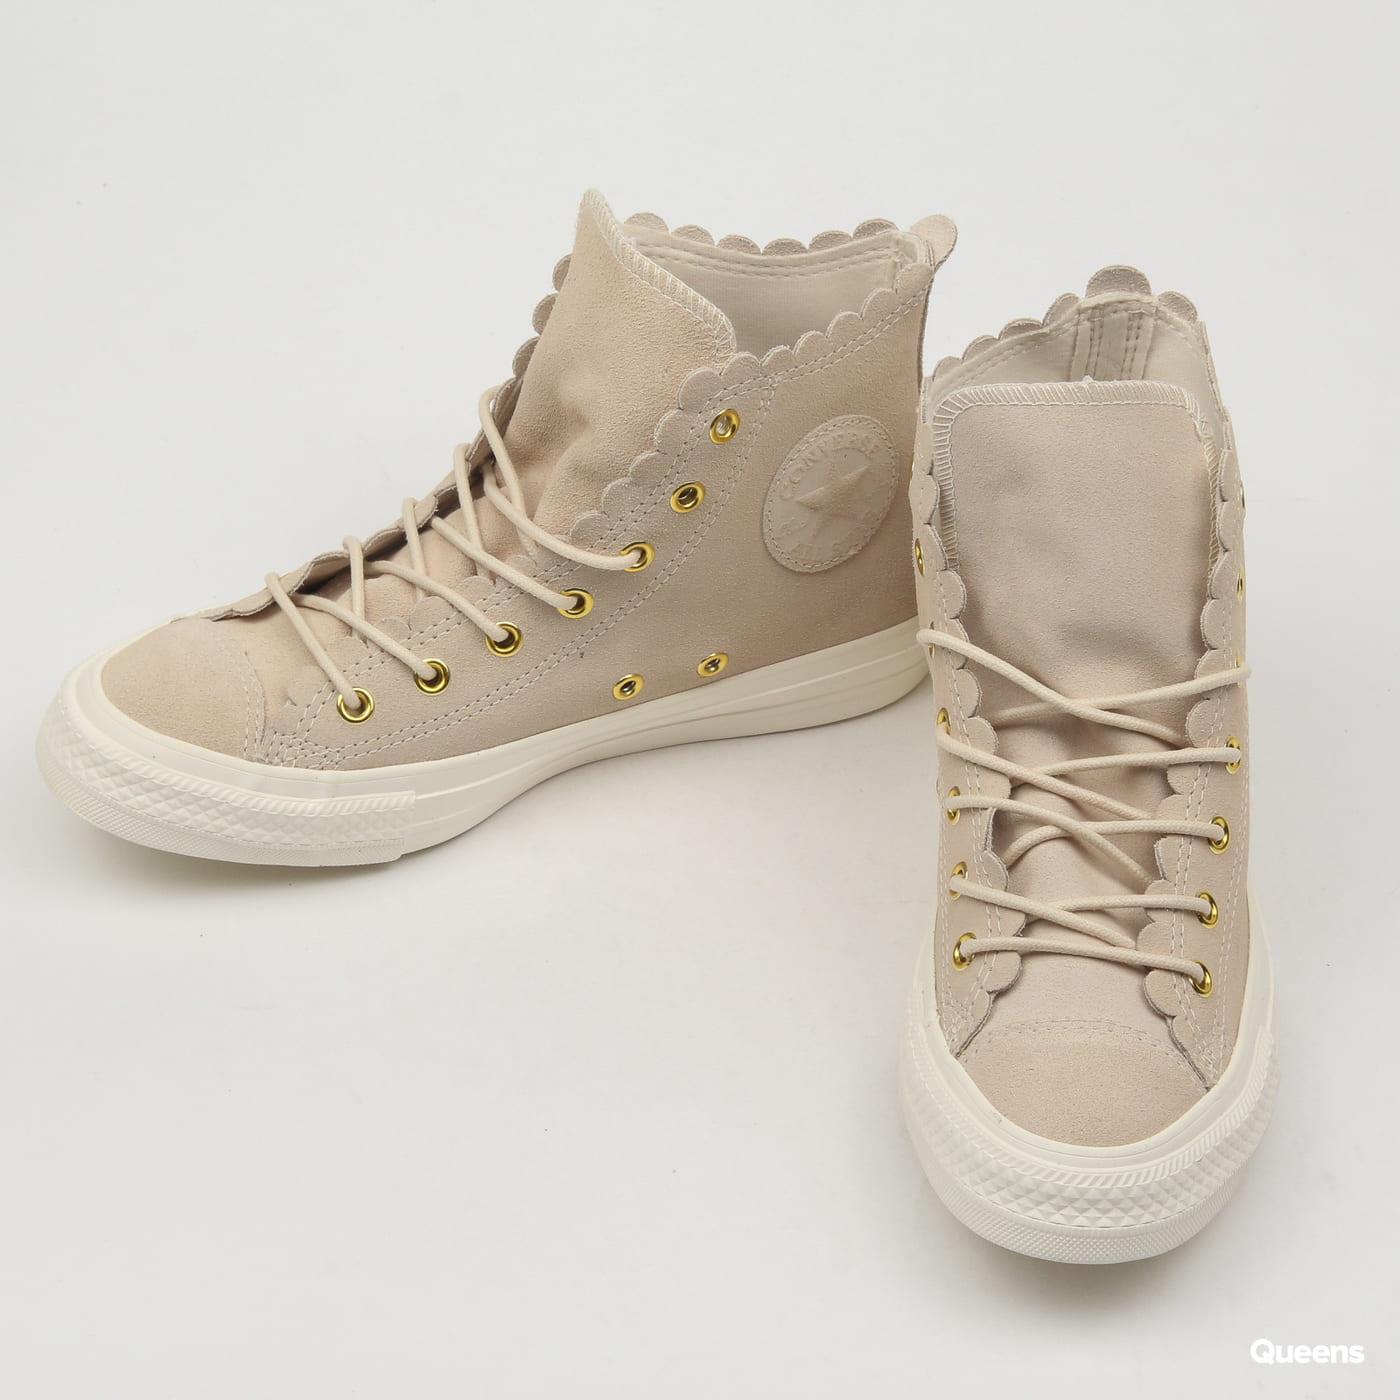 Converse Chuck Taylor All Star Hi natural ivory / gold / egret